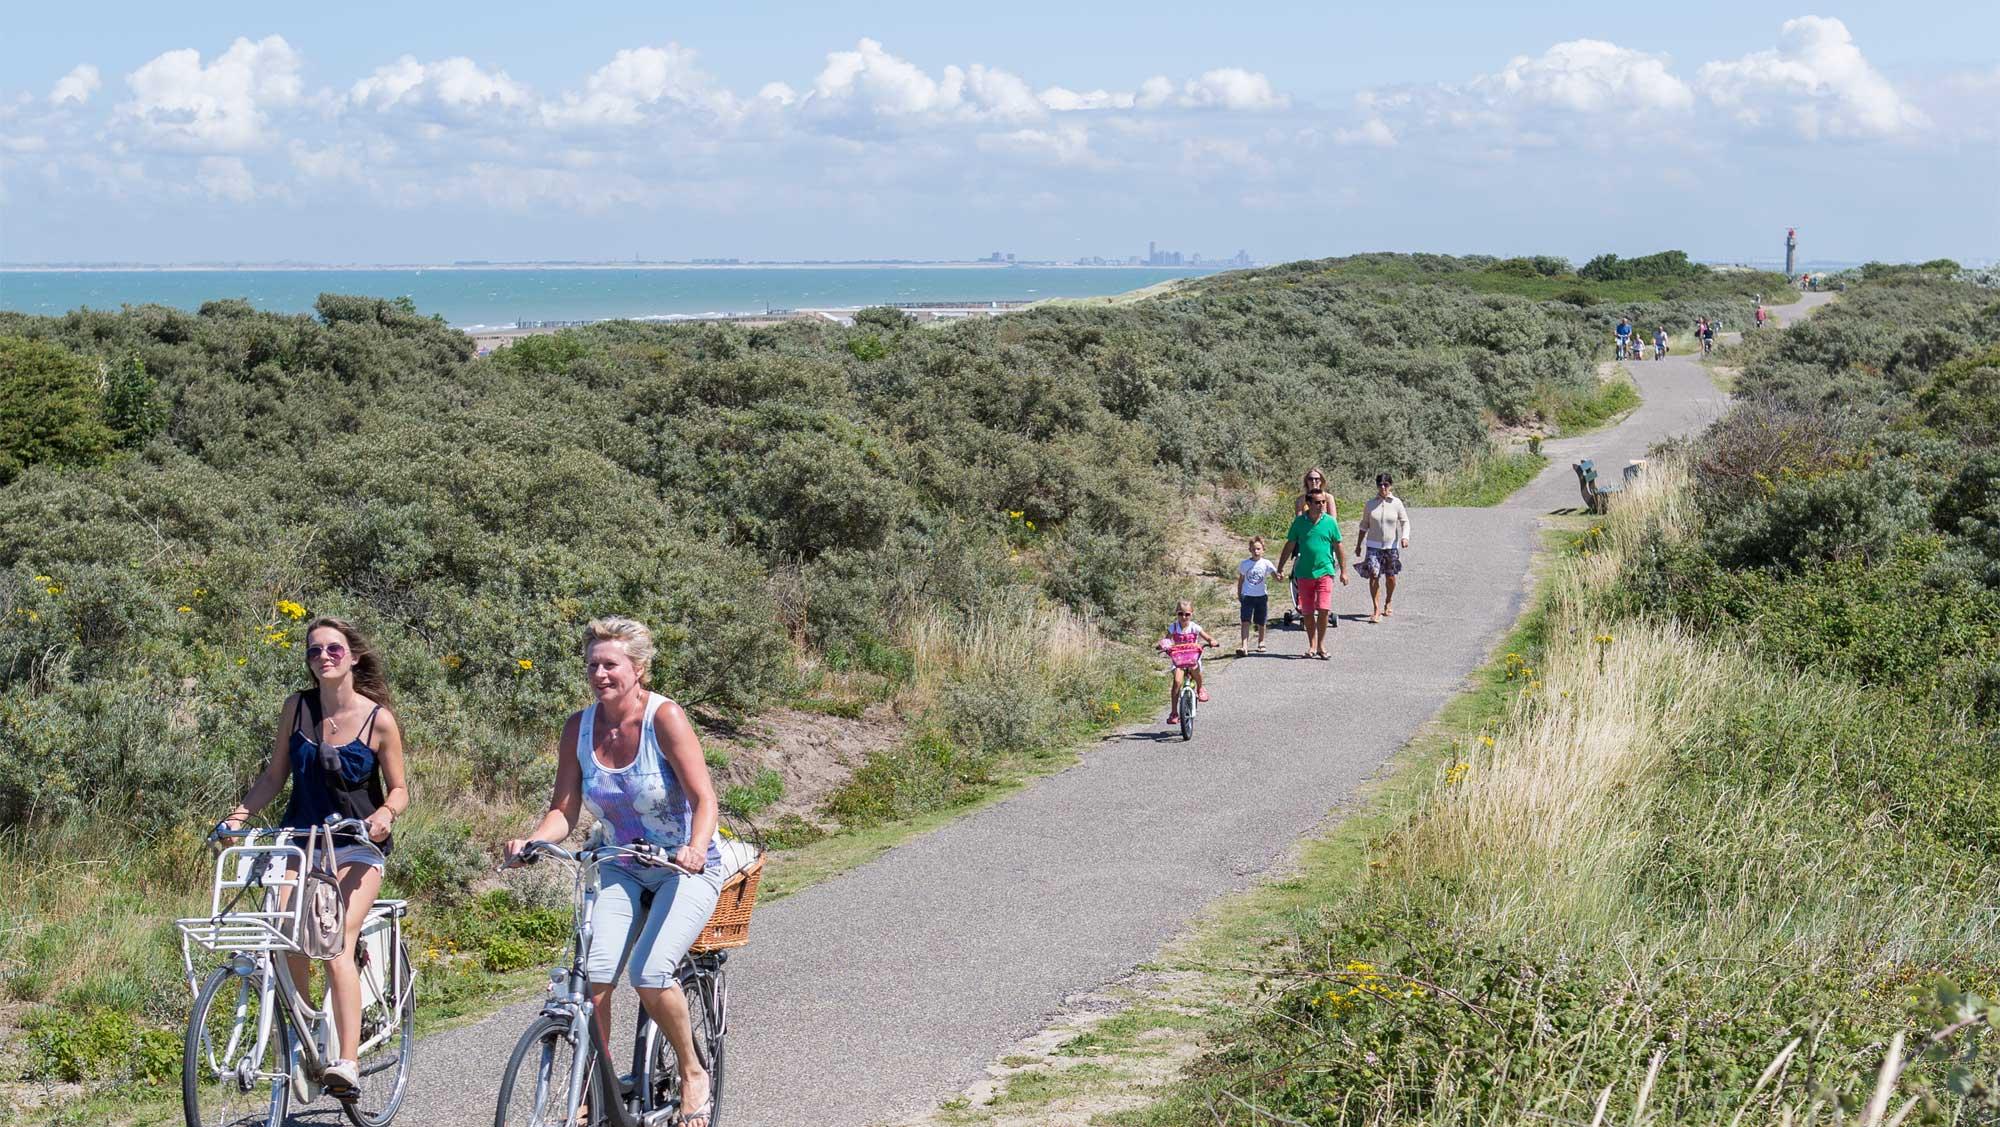 Omgeving Molecaten Park Hoogduin 04 strand zeeland